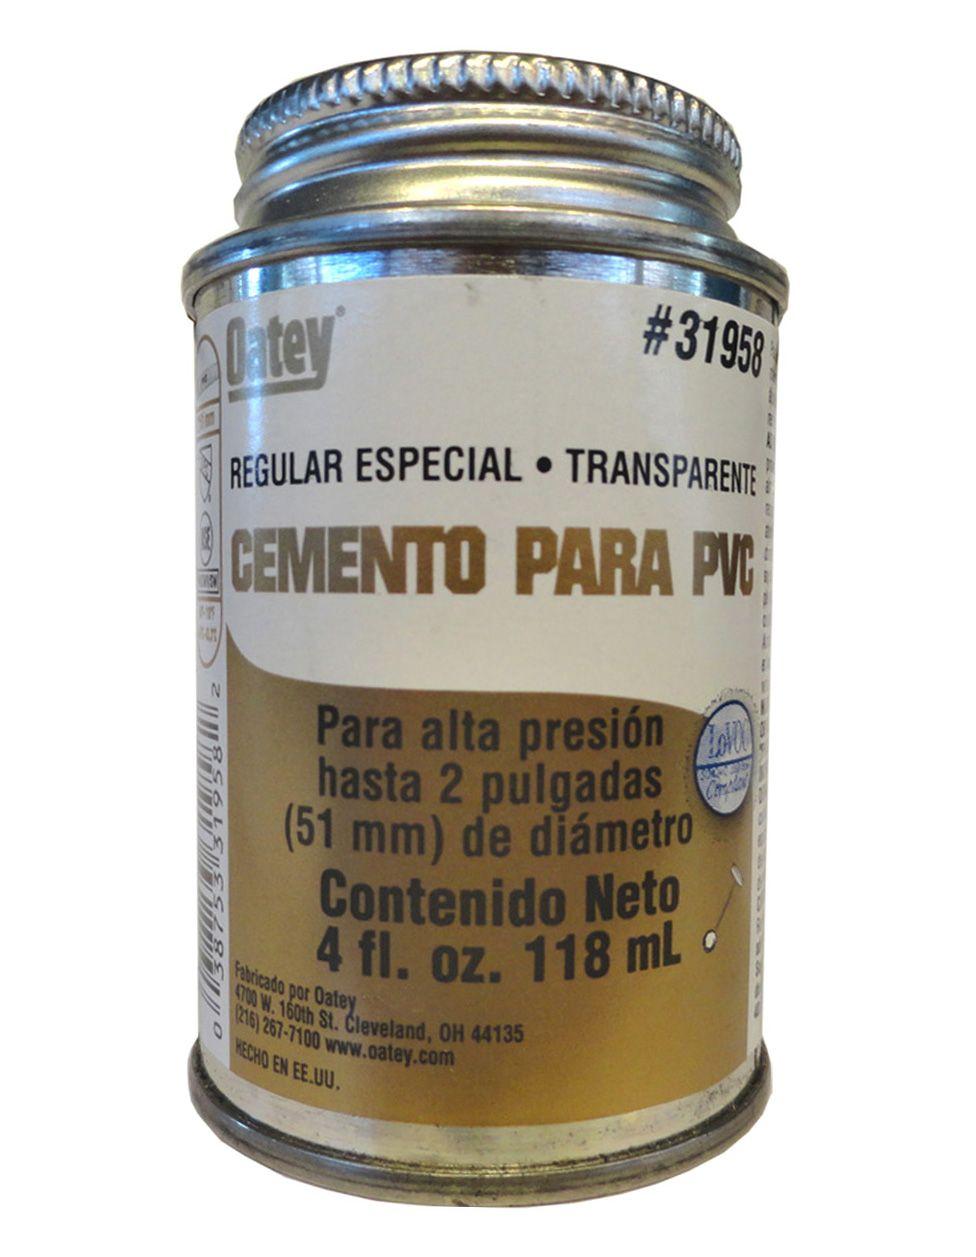 Pegamento oatey regular dorado 118 ml para tuber as de for Productos para desatascar tuberias